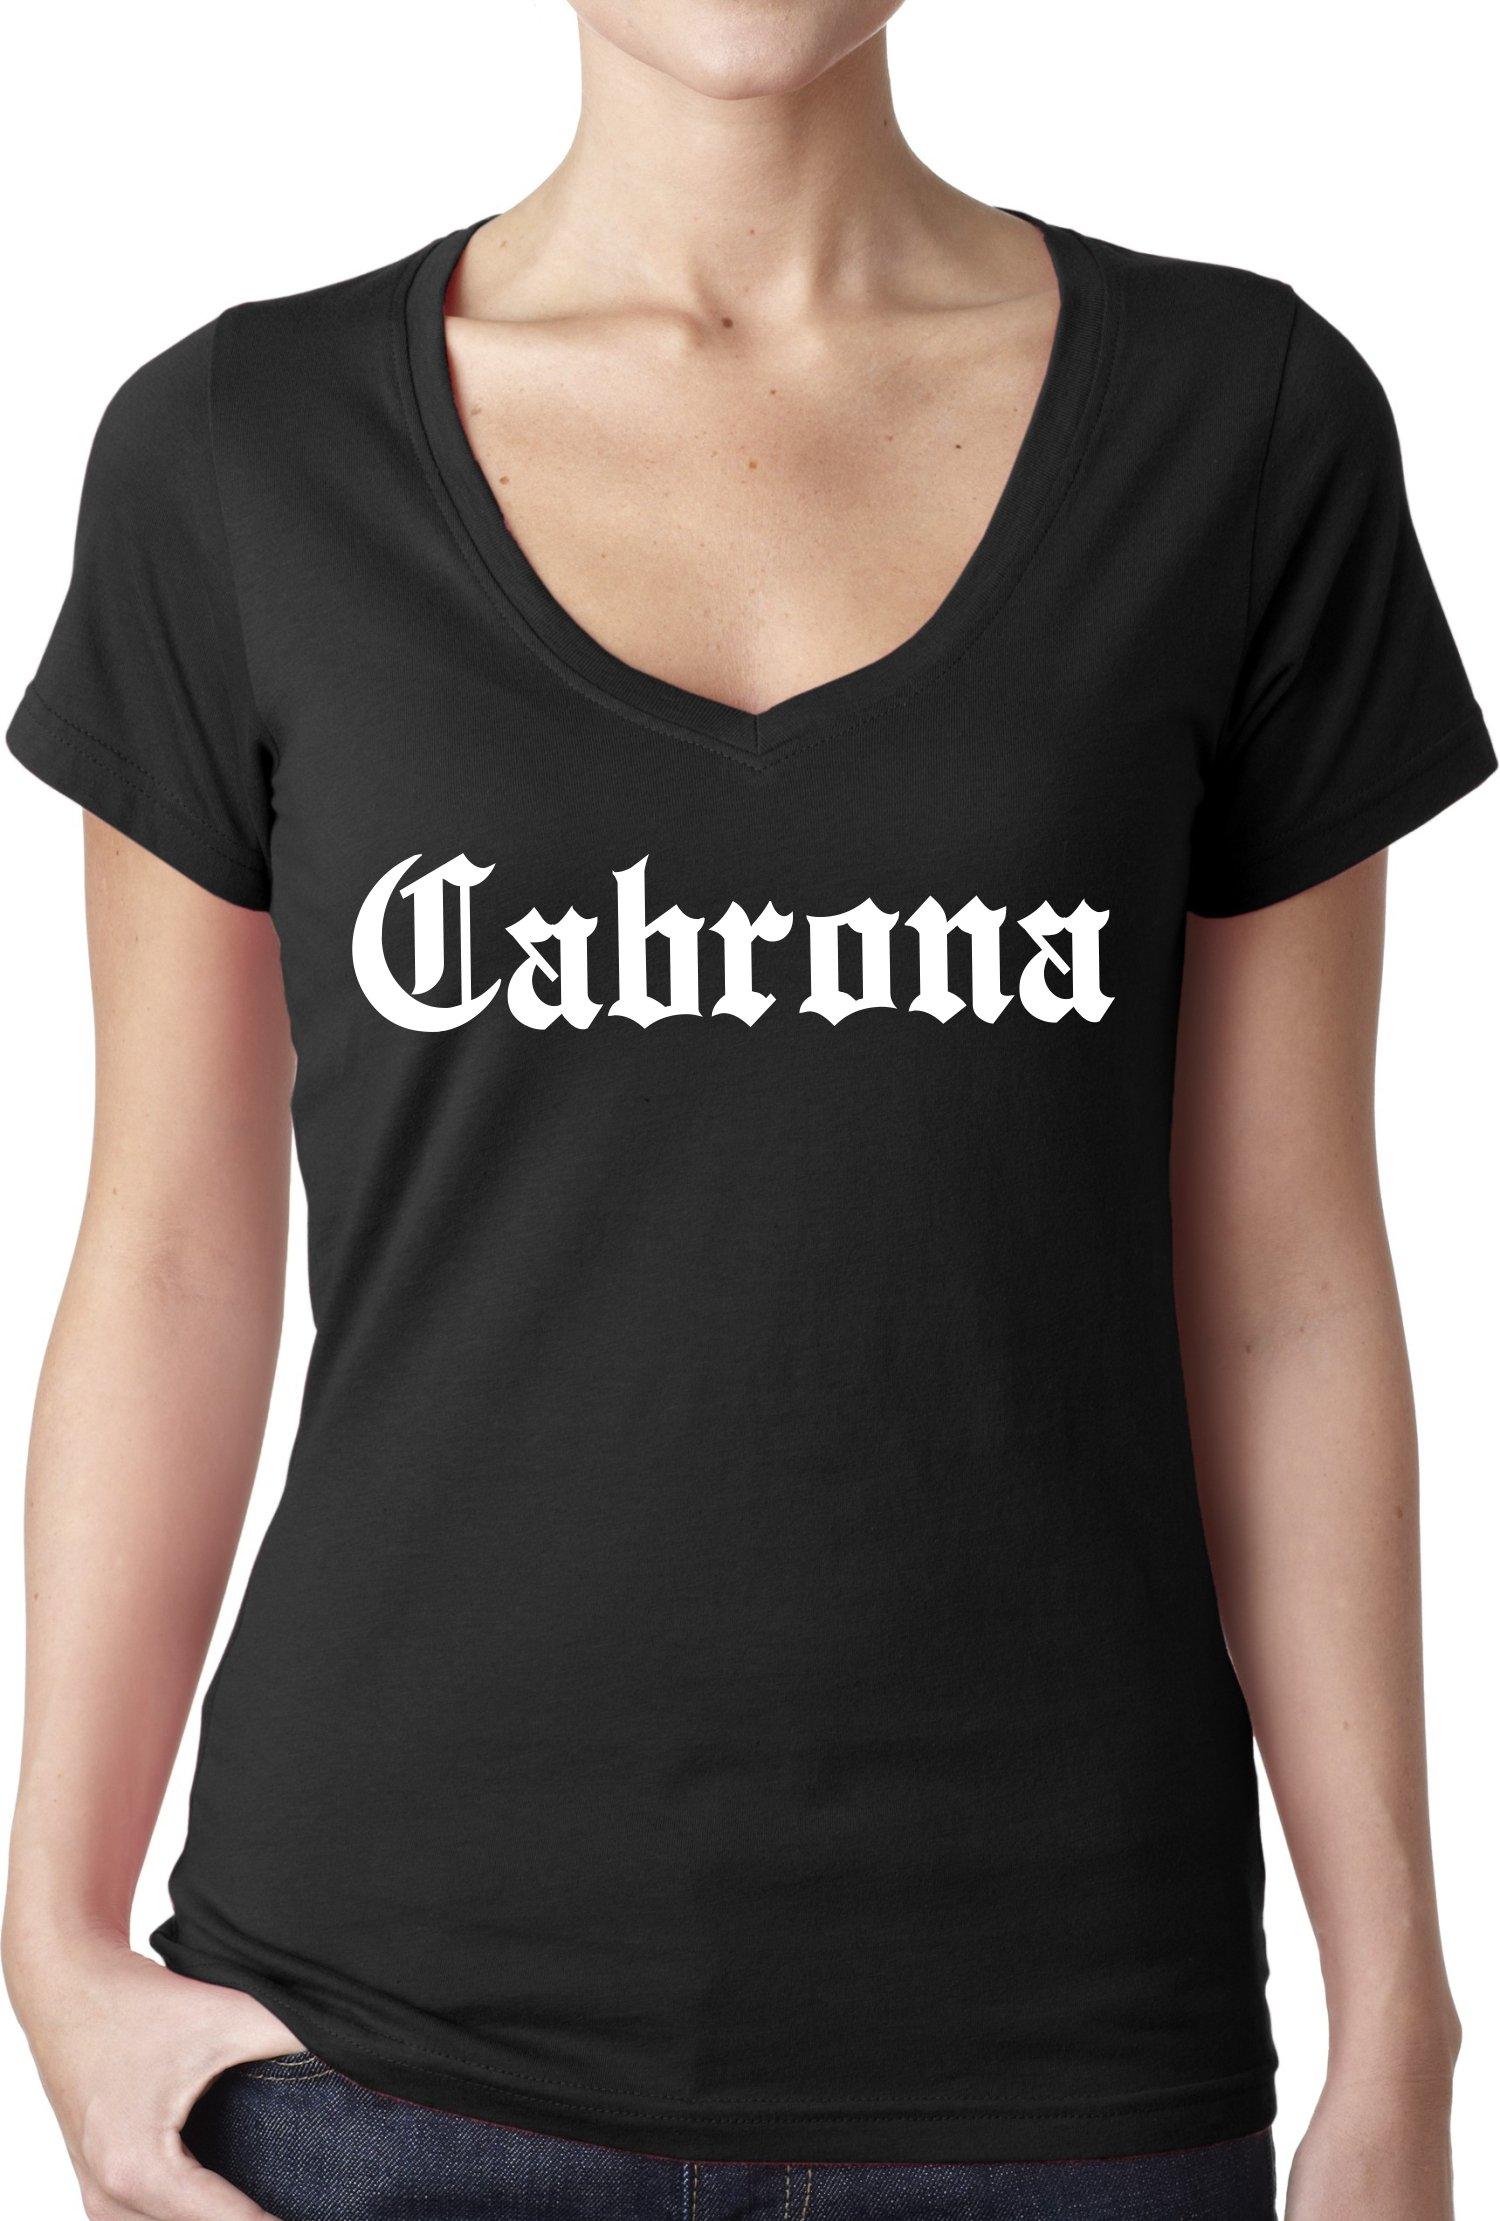 Chamuco Customs Cabrona Funny Mexican Latina Chicana Chola Spanish T Shirt S V N